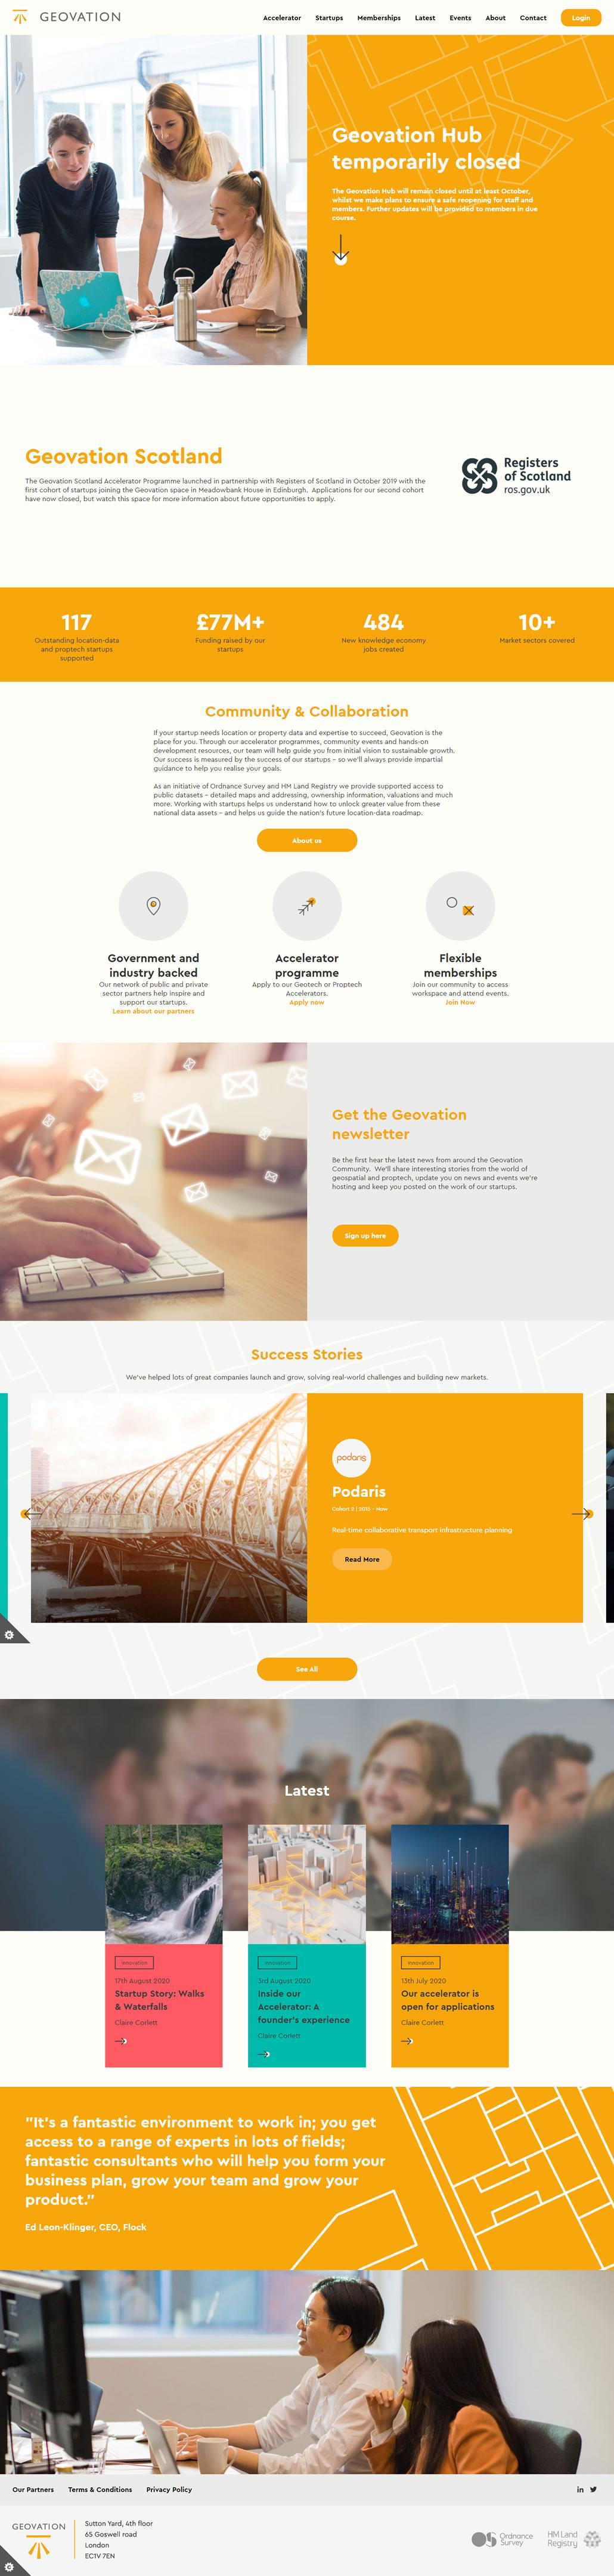 Geovation built using WordPress, web design by Convoy Media